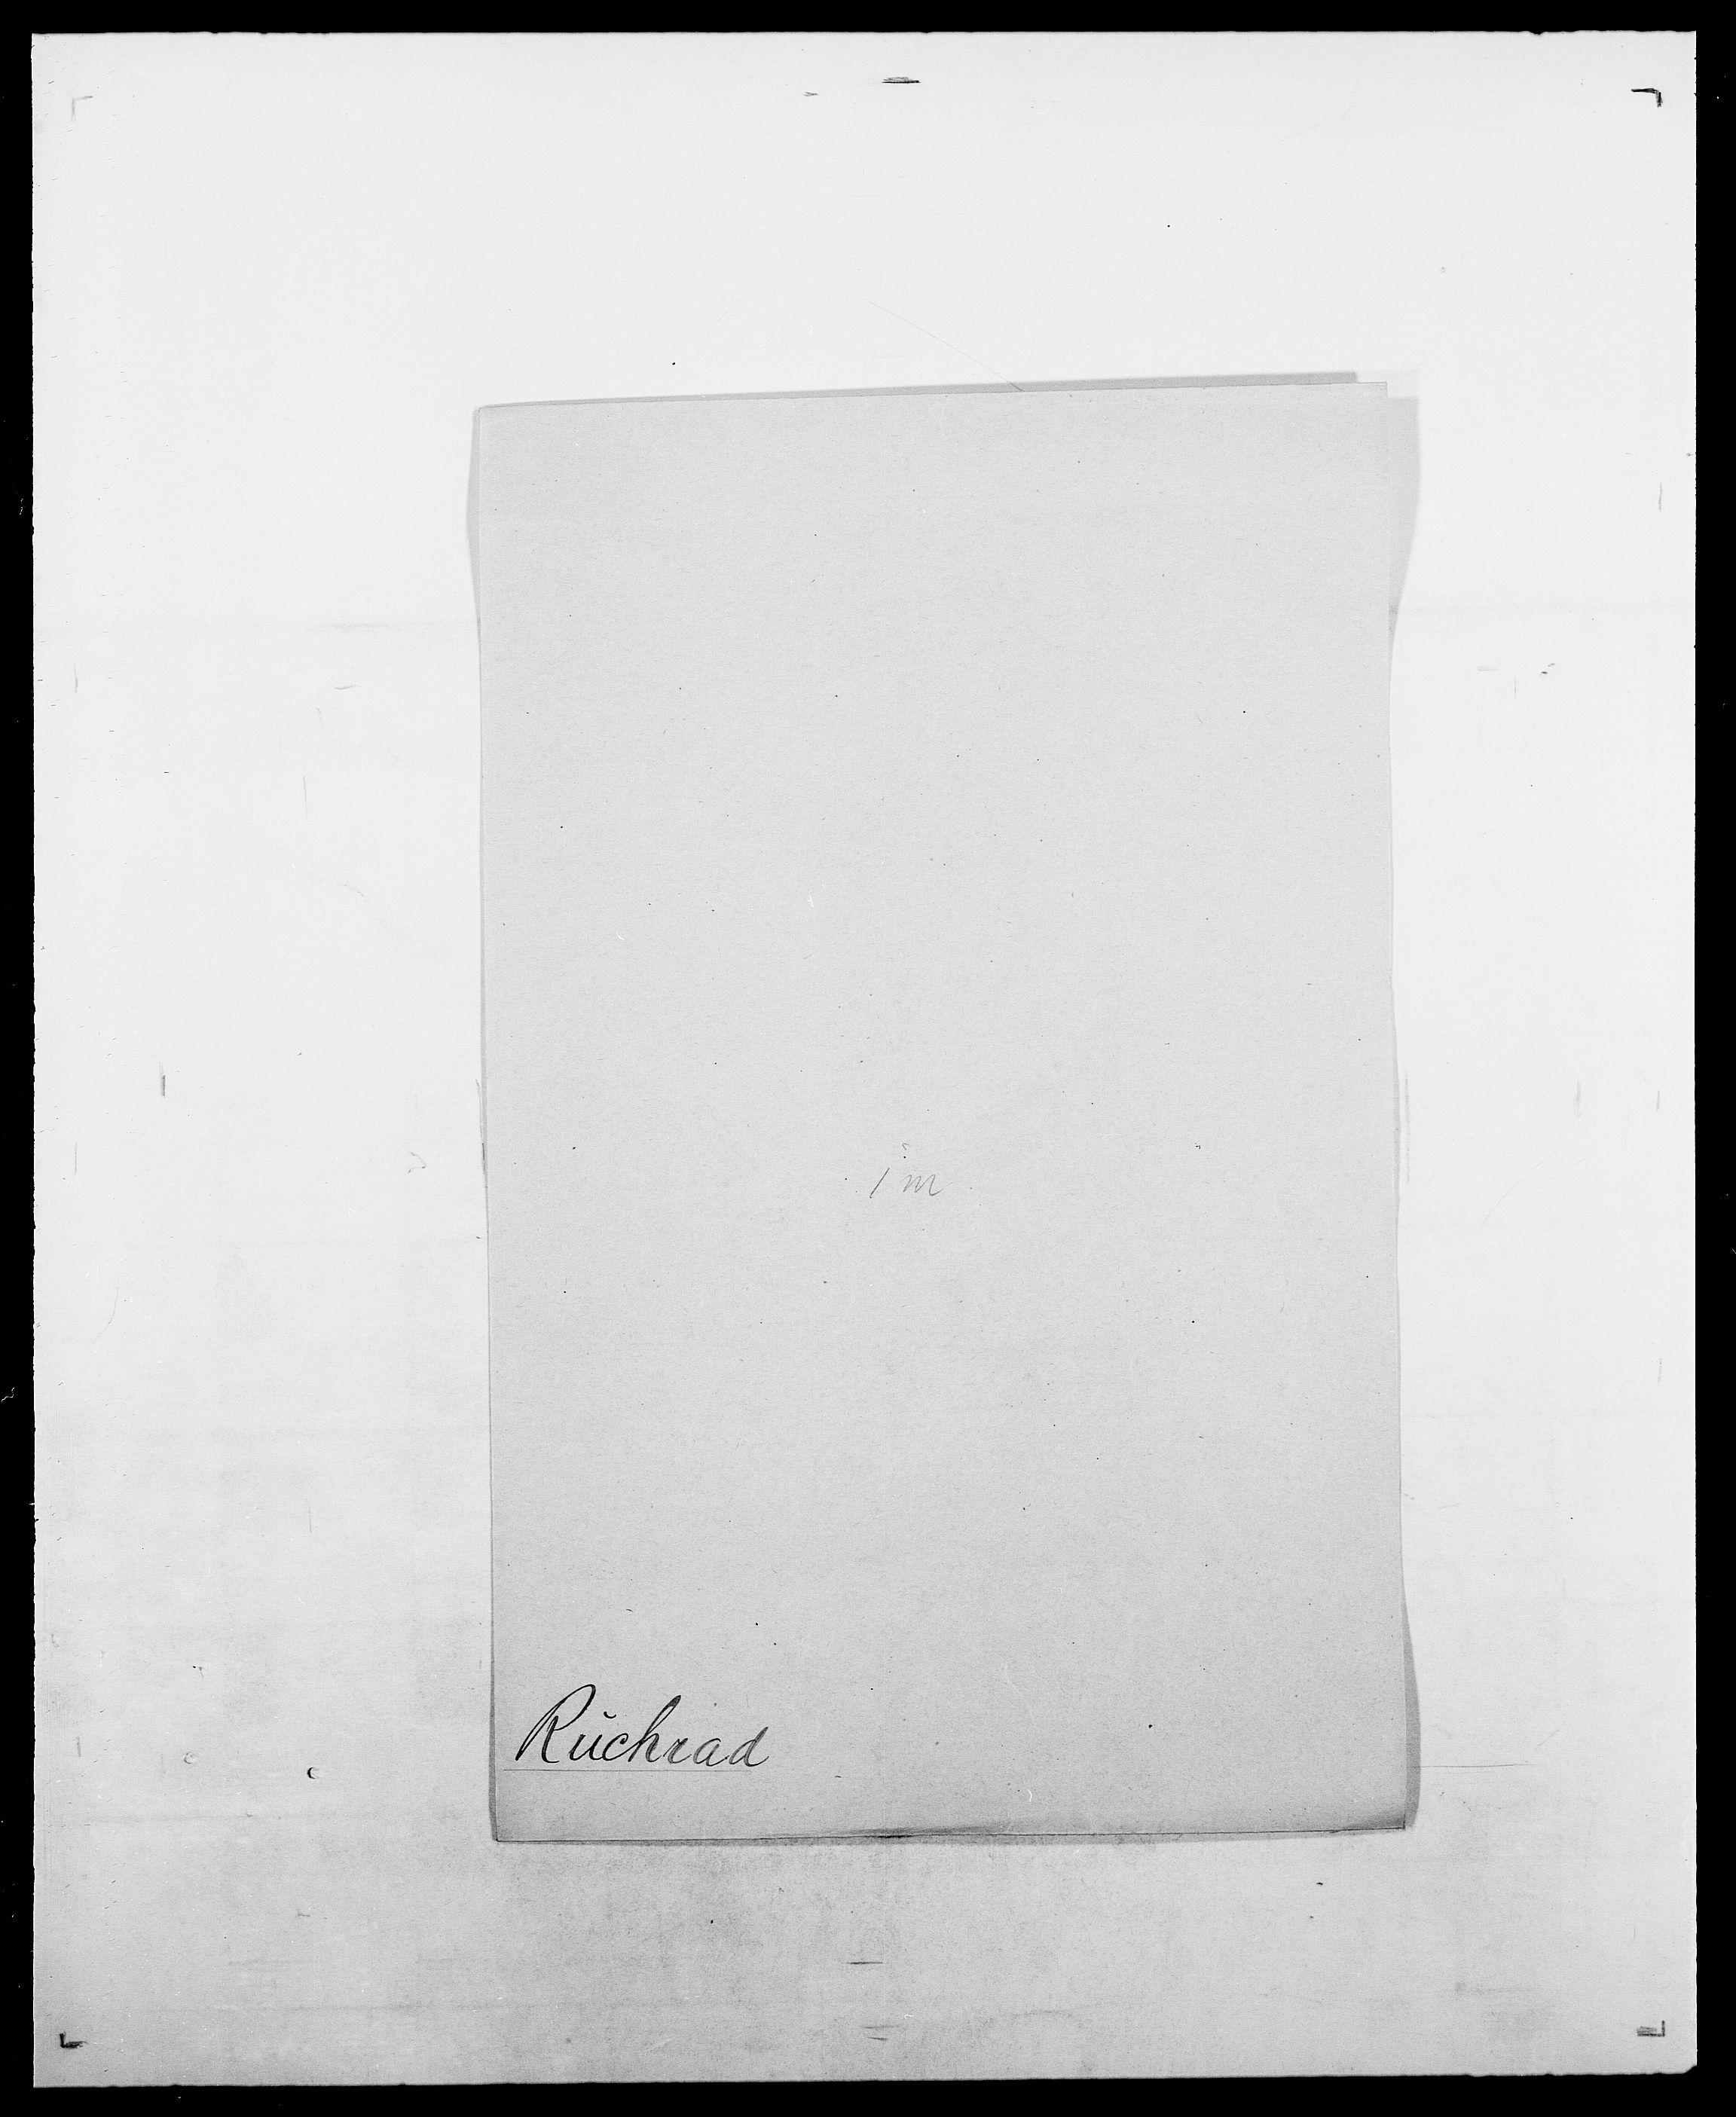 SAO, Delgobe, Charles Antoine - samling, D/Da/L0033: Roald - Røyem, s. 417